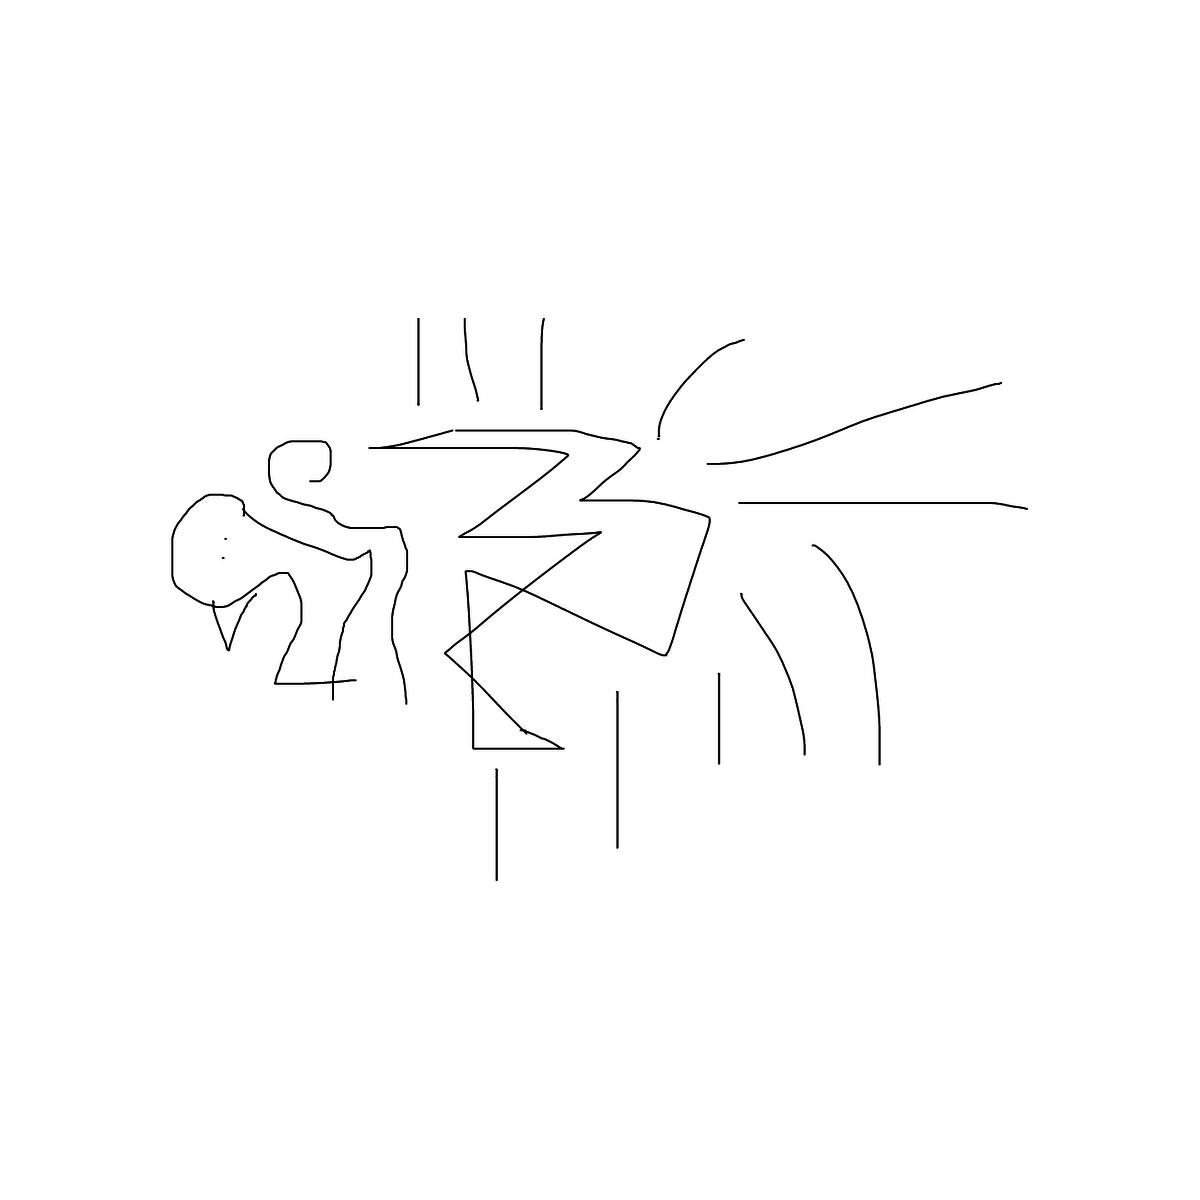 BAAAM drawing#82 lat:52.9451026916503900lng: 1.2128529548645020